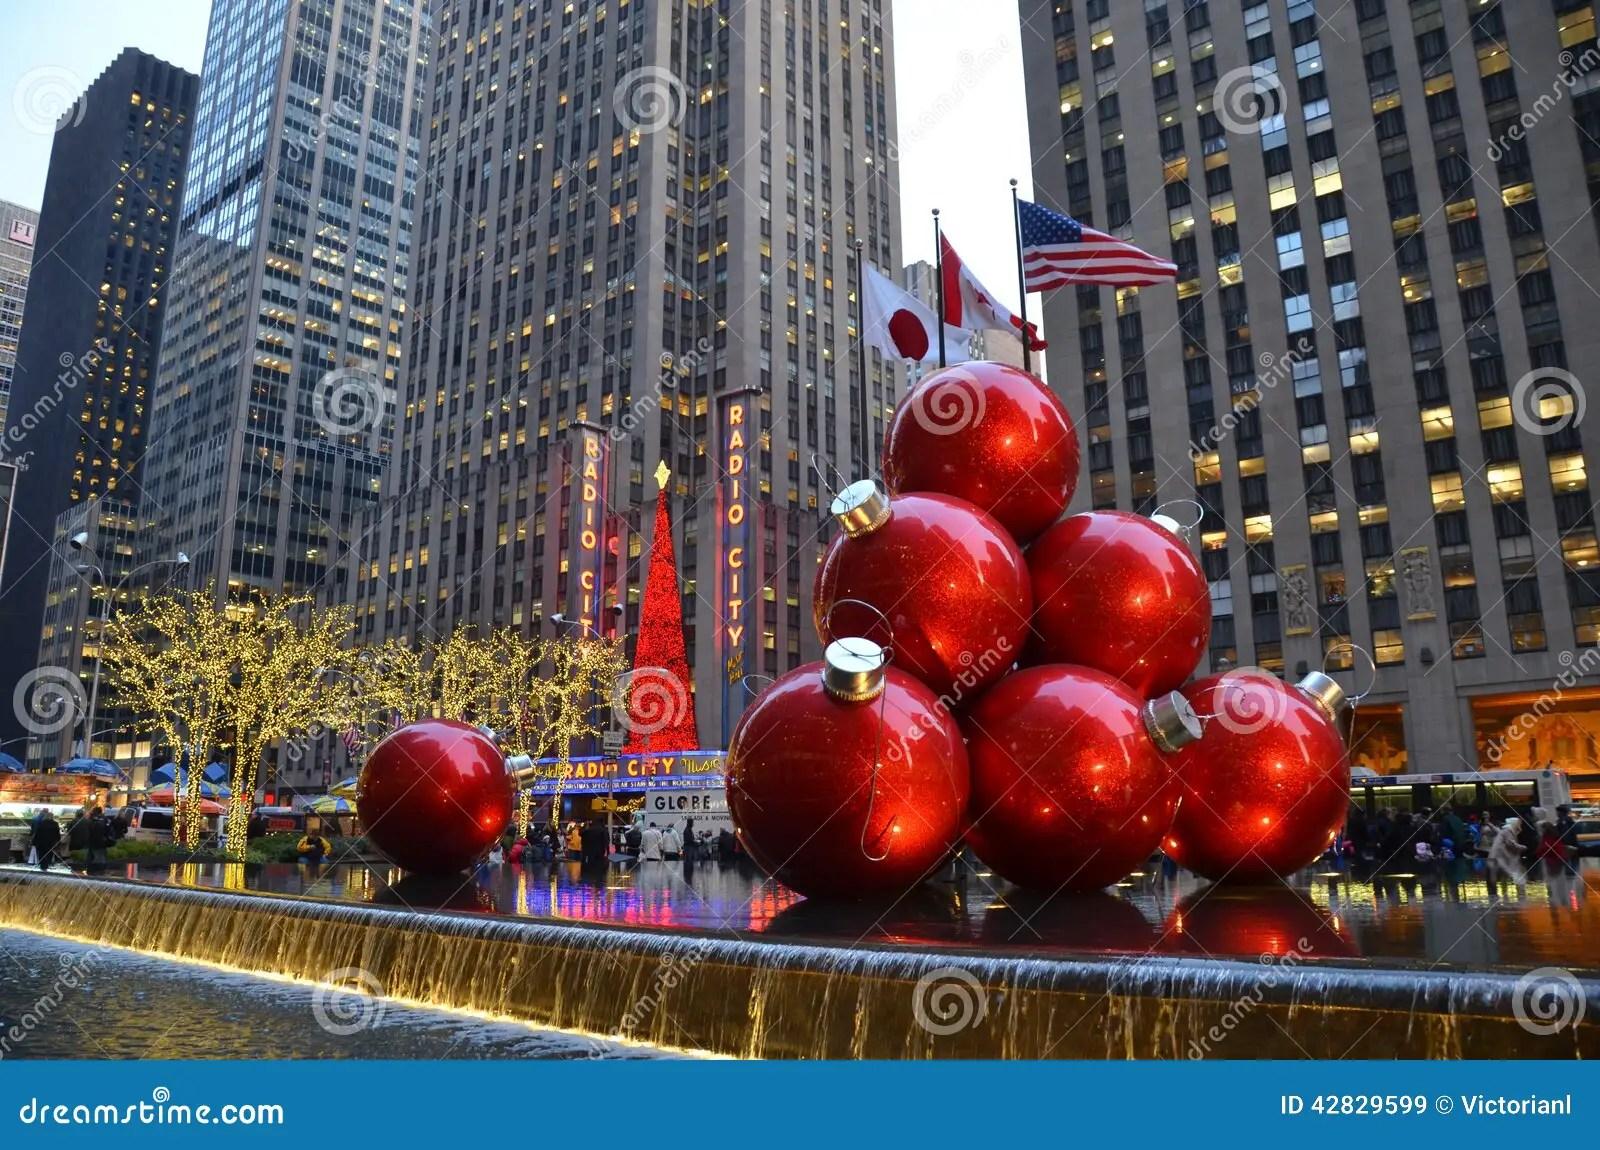 NEW YORK CIGiant Christmas Ornaments In Midtown Manhattan